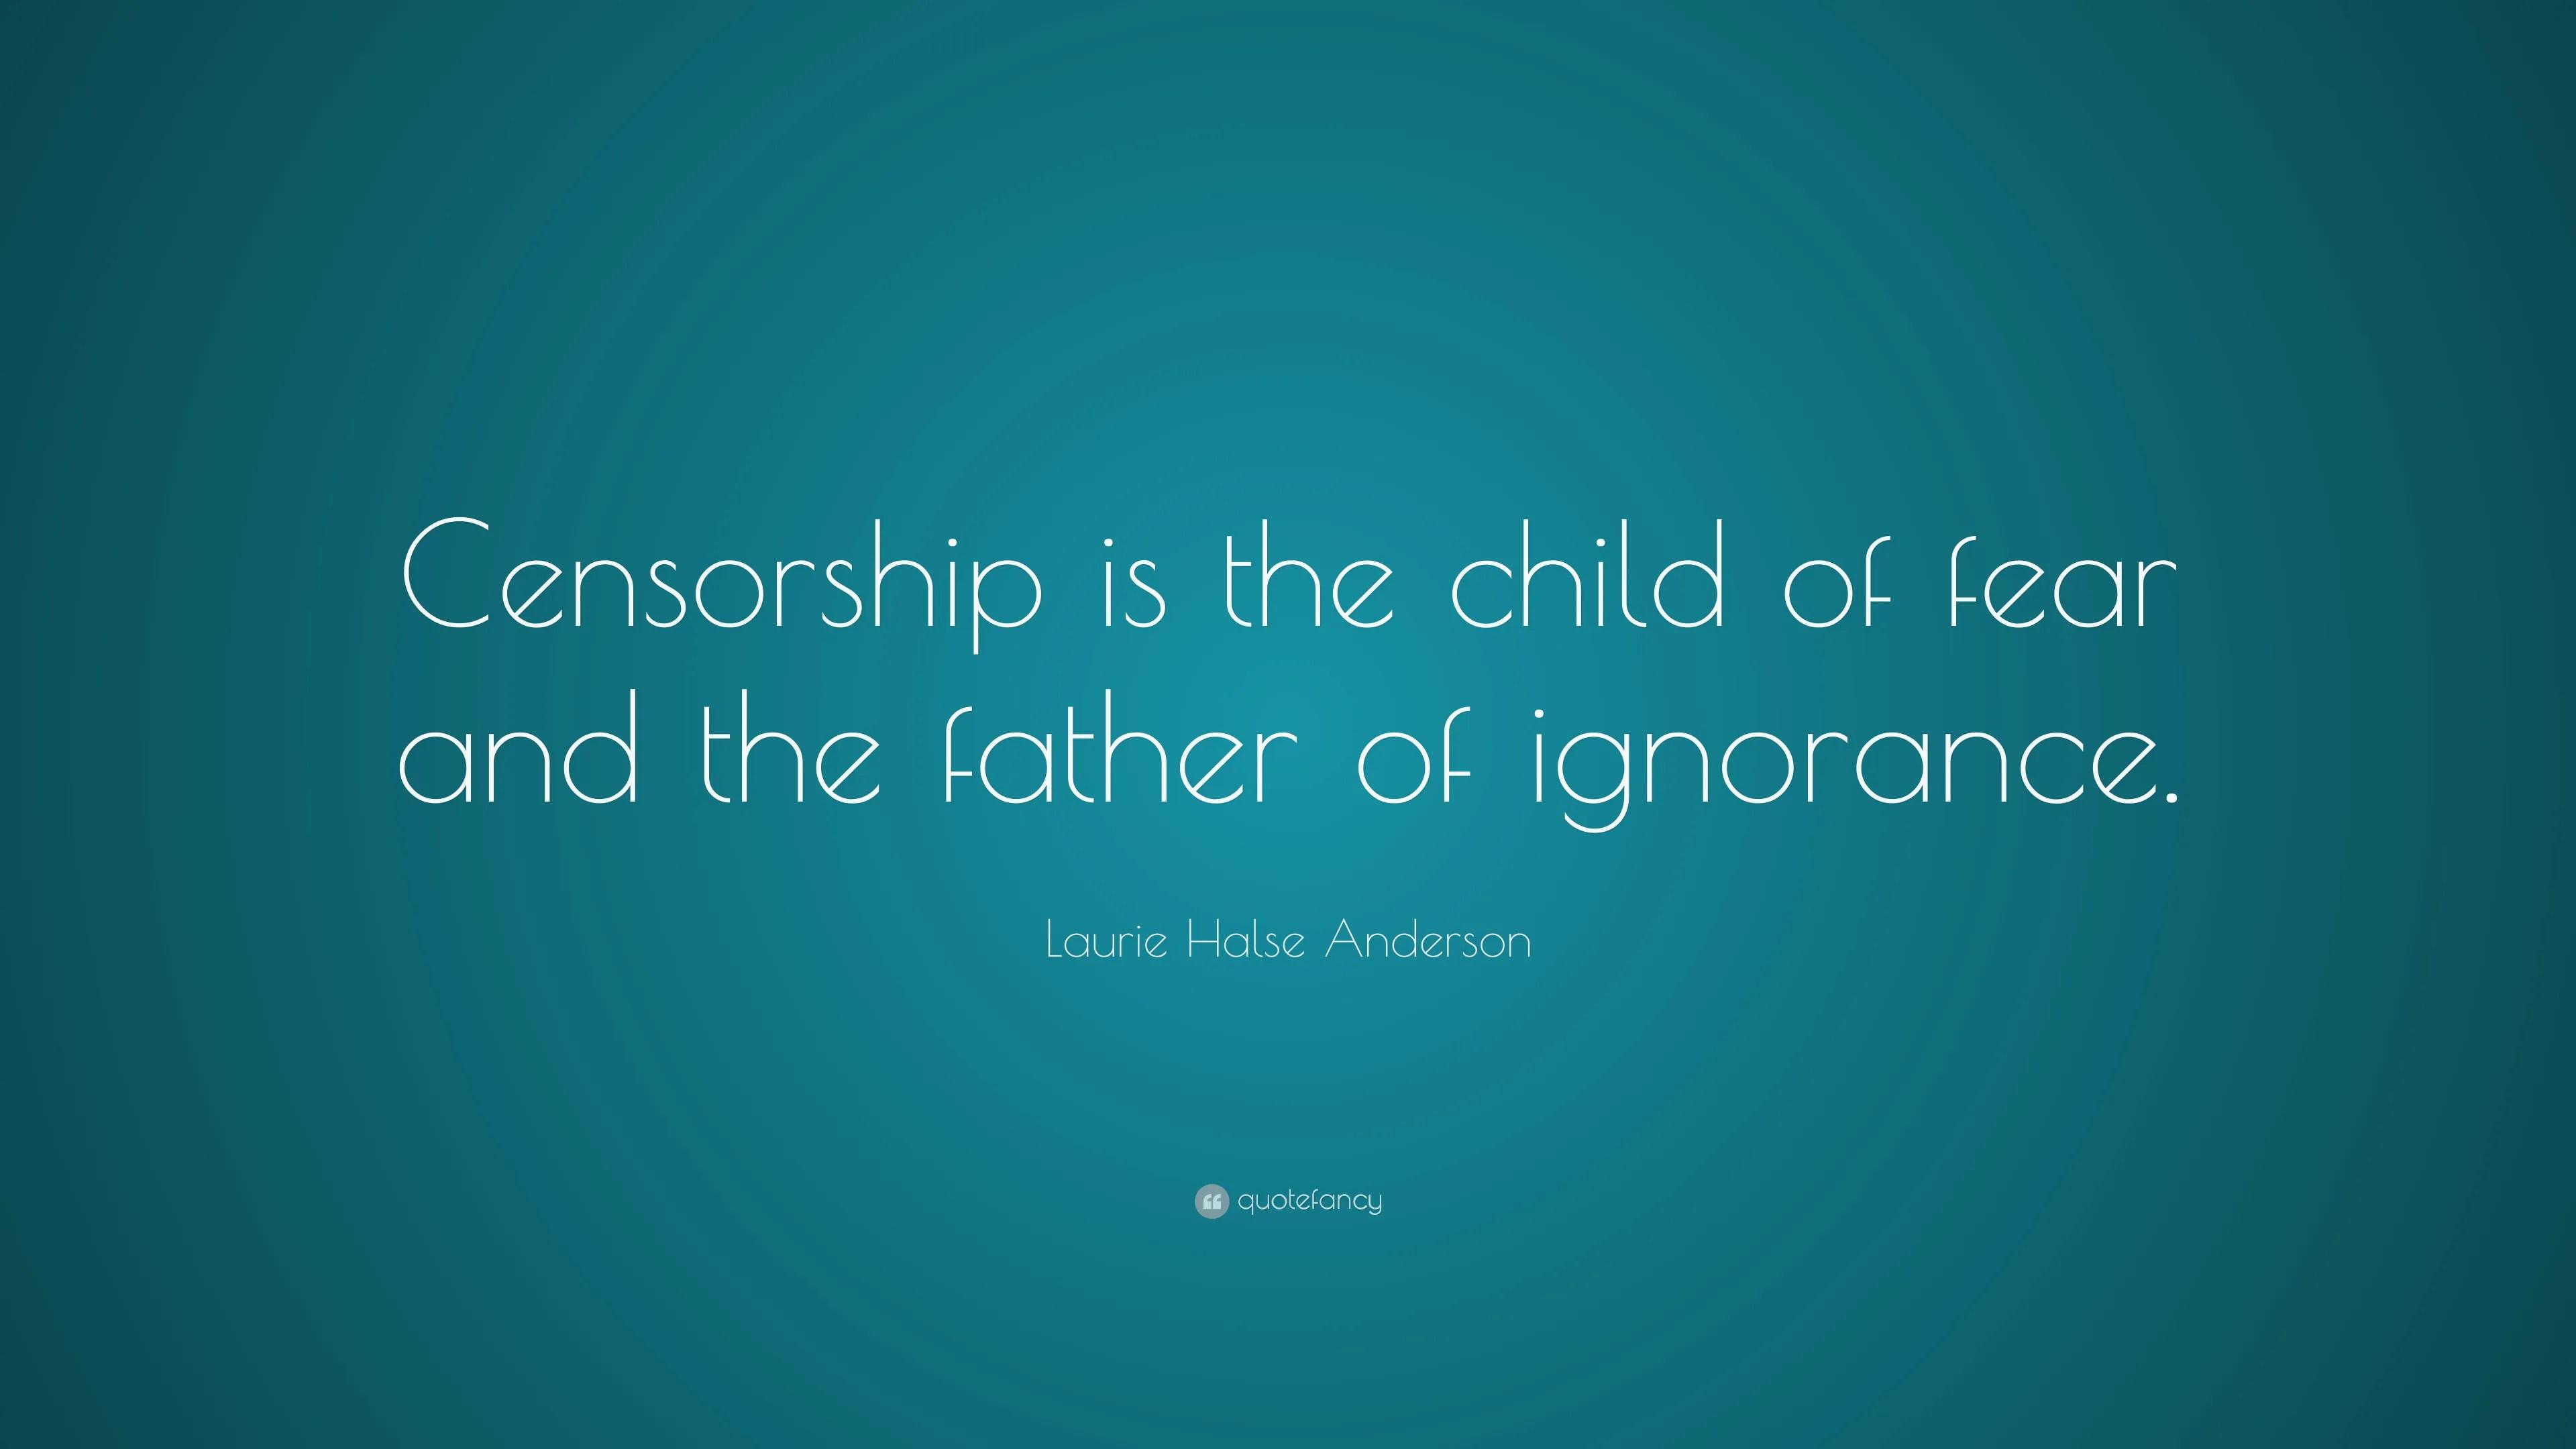 Information warfare - Censorship quote